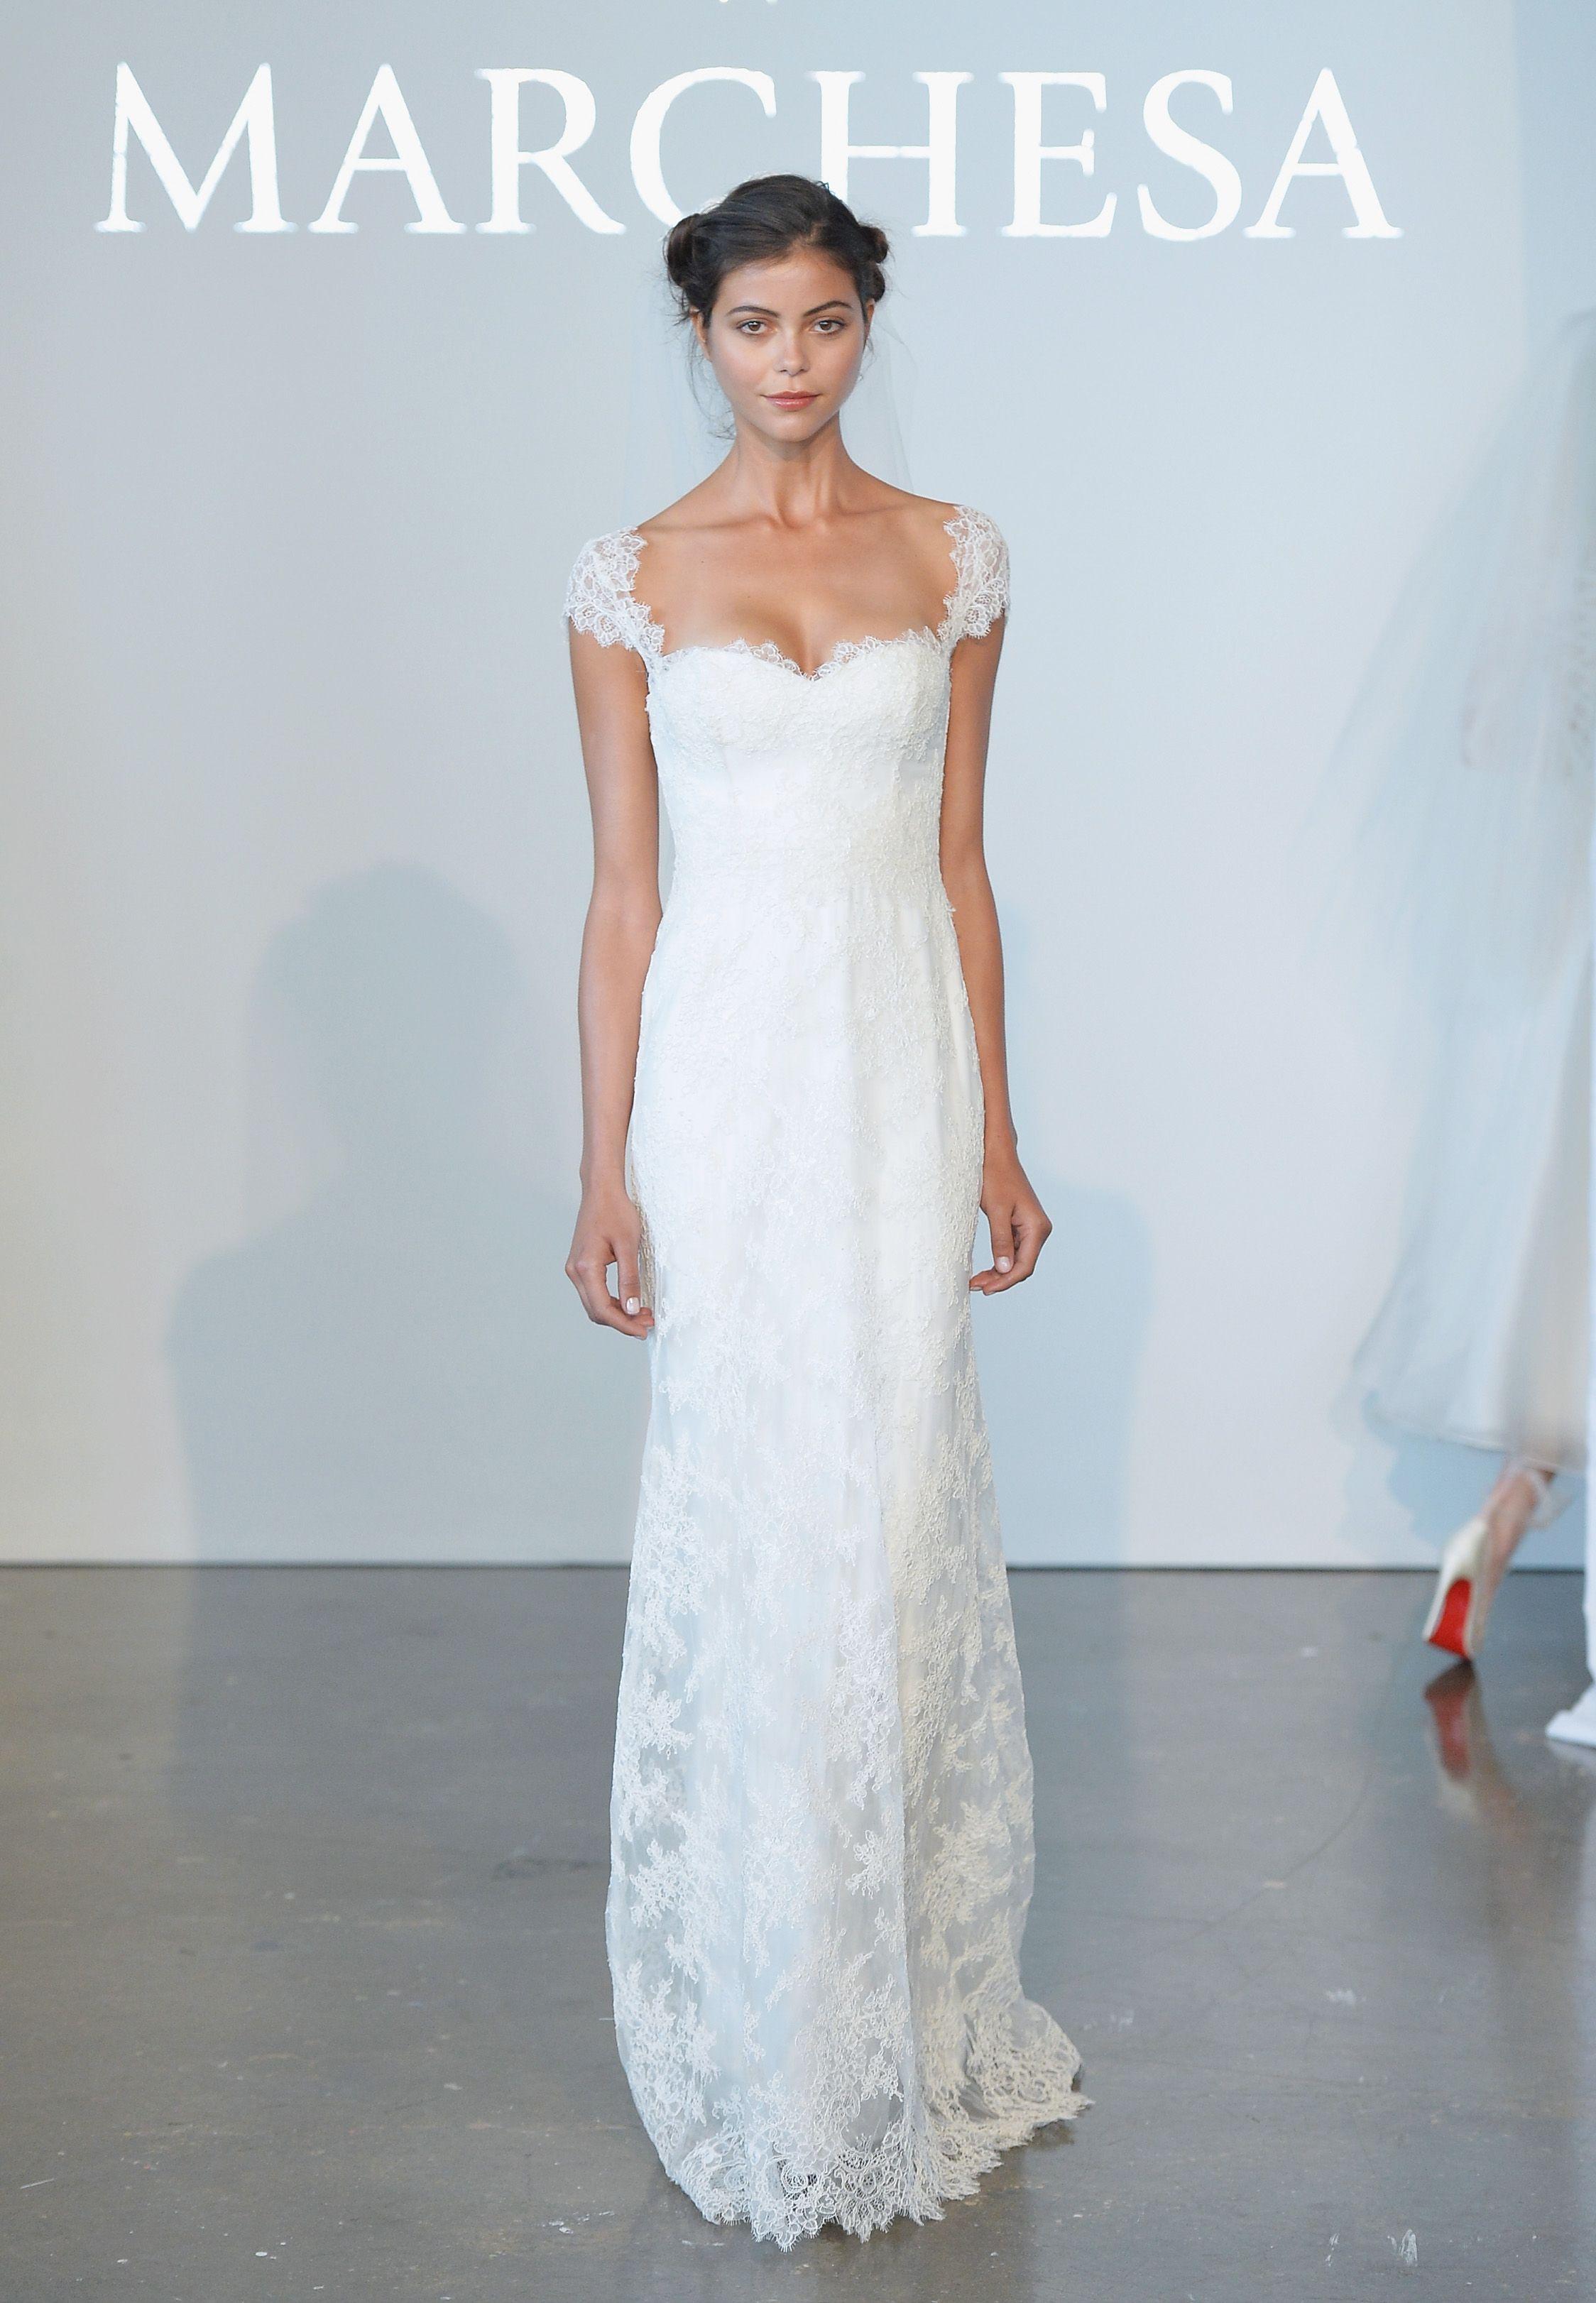 Attractive Marchesa Short Wedding Dress Component - All Wedding ...